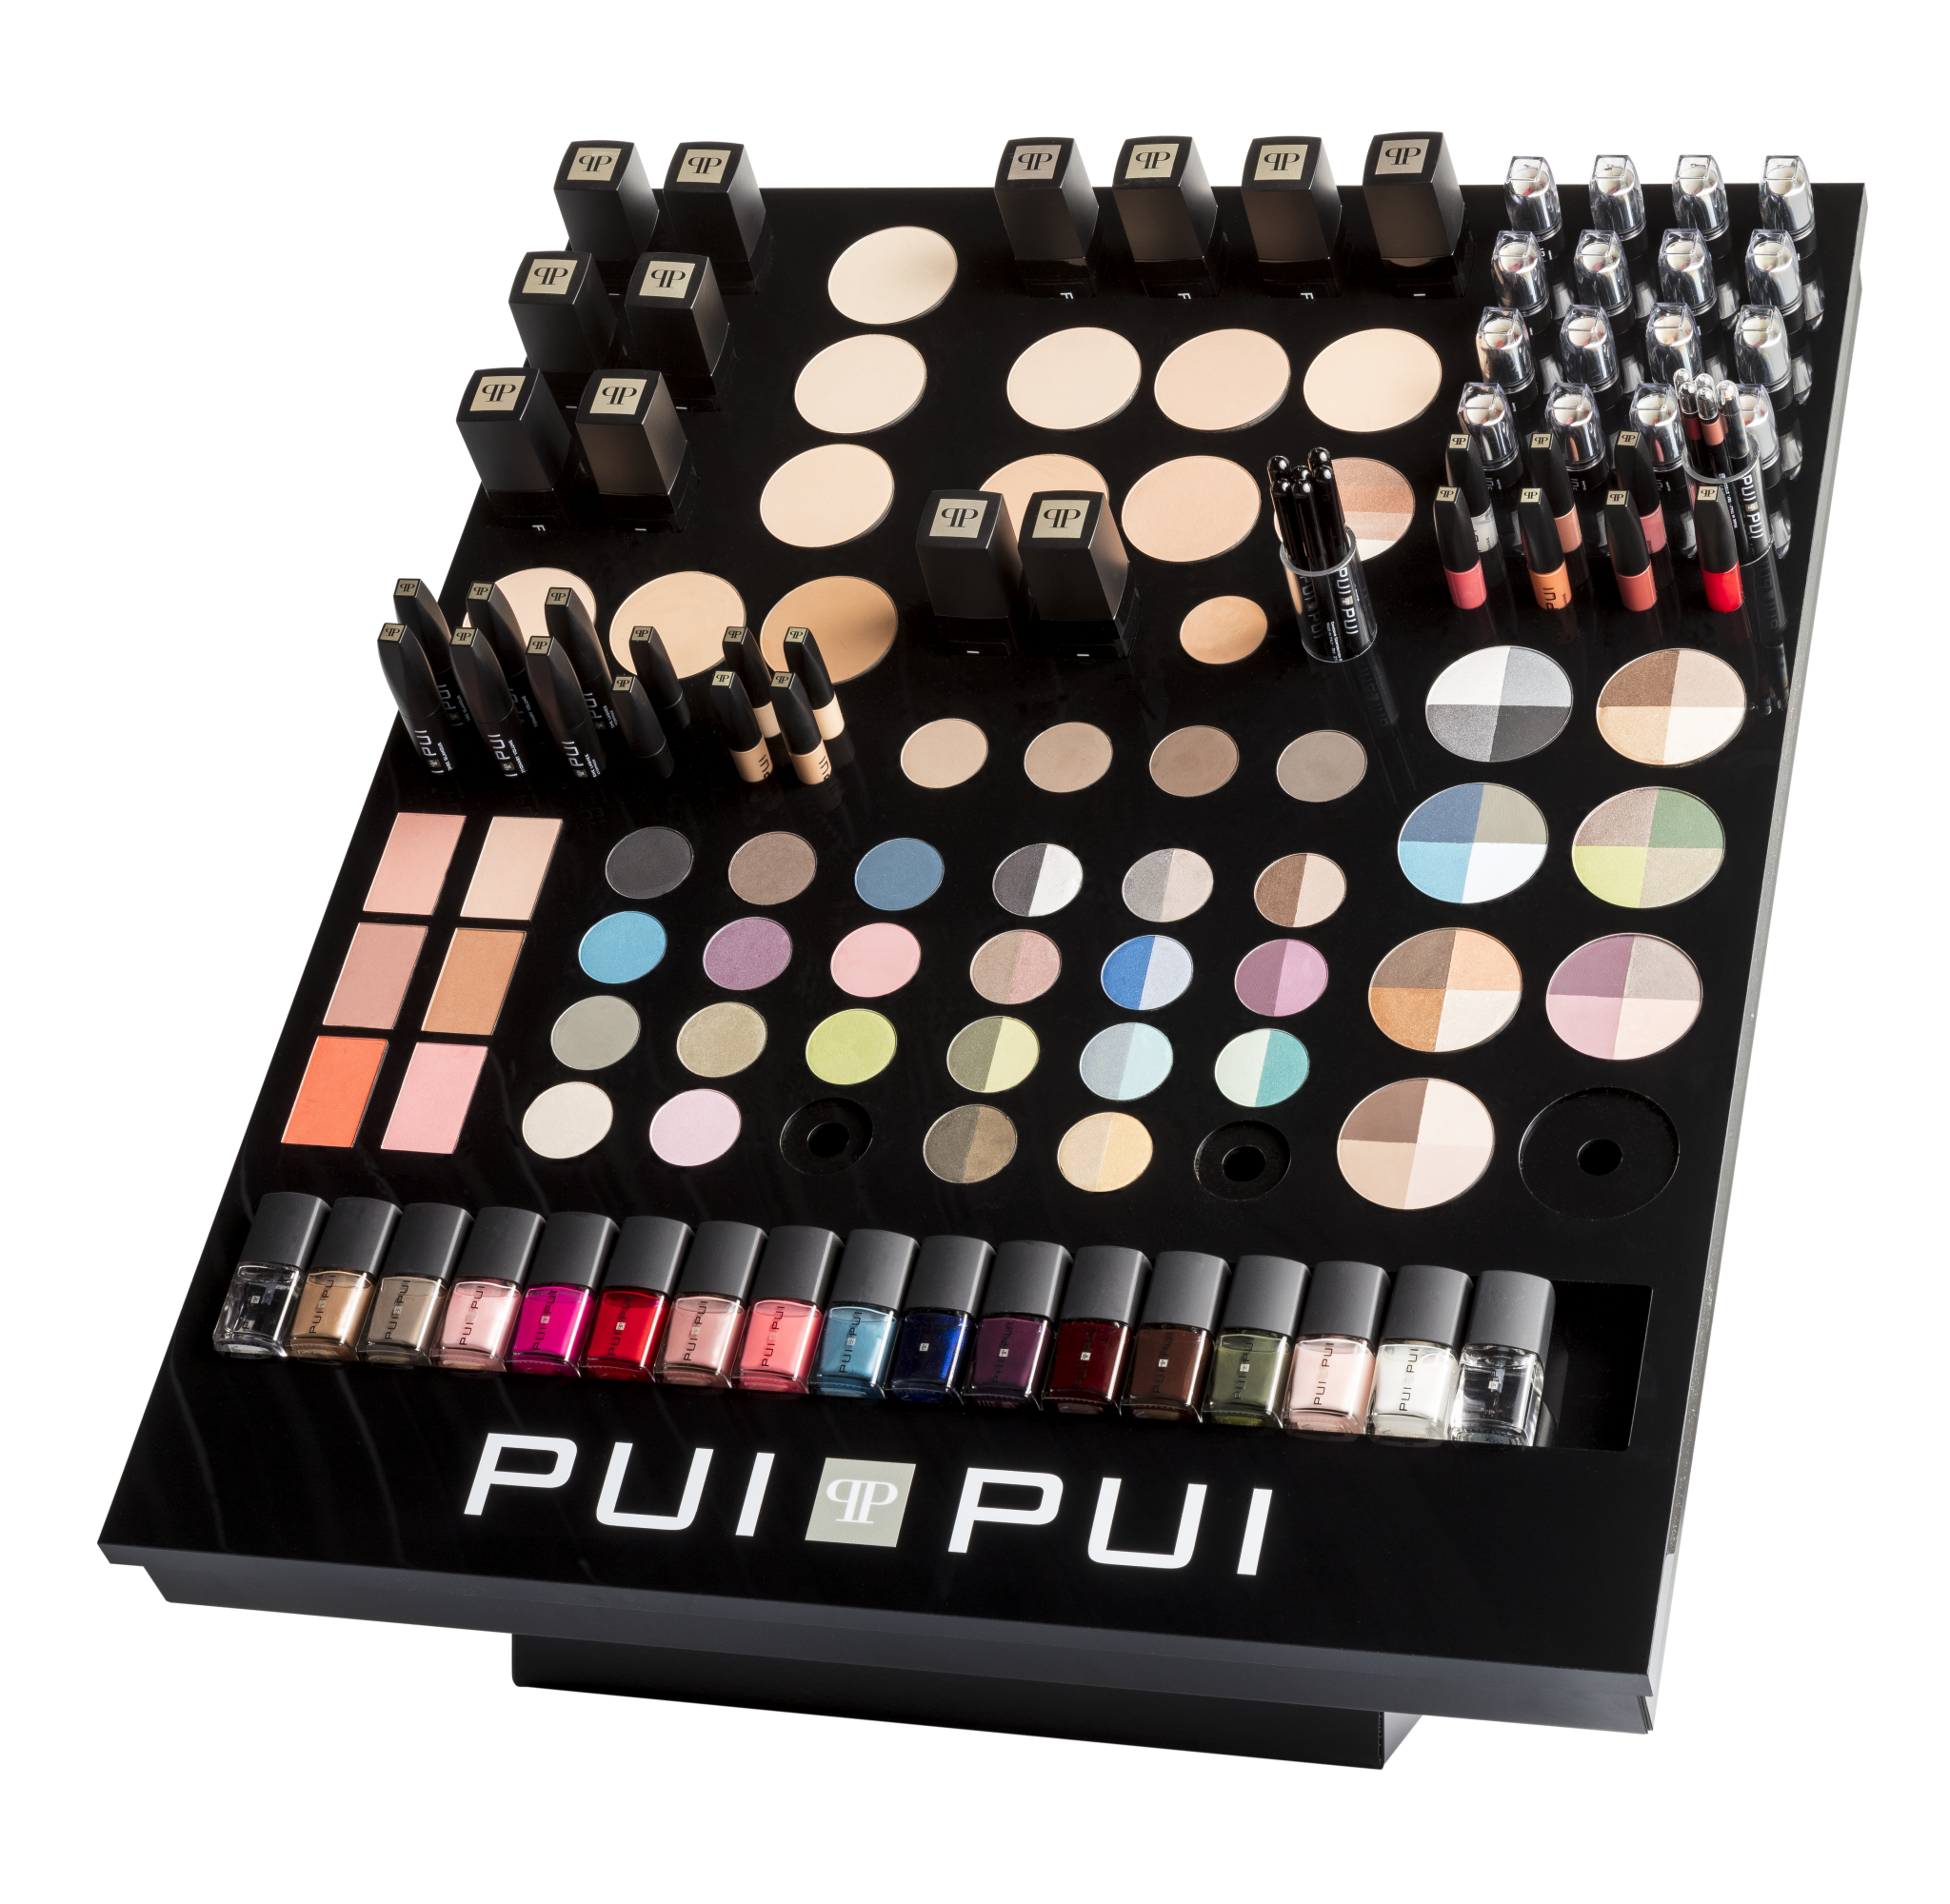 28600 Pui Pui Presentatiedisplay 01 - vrij